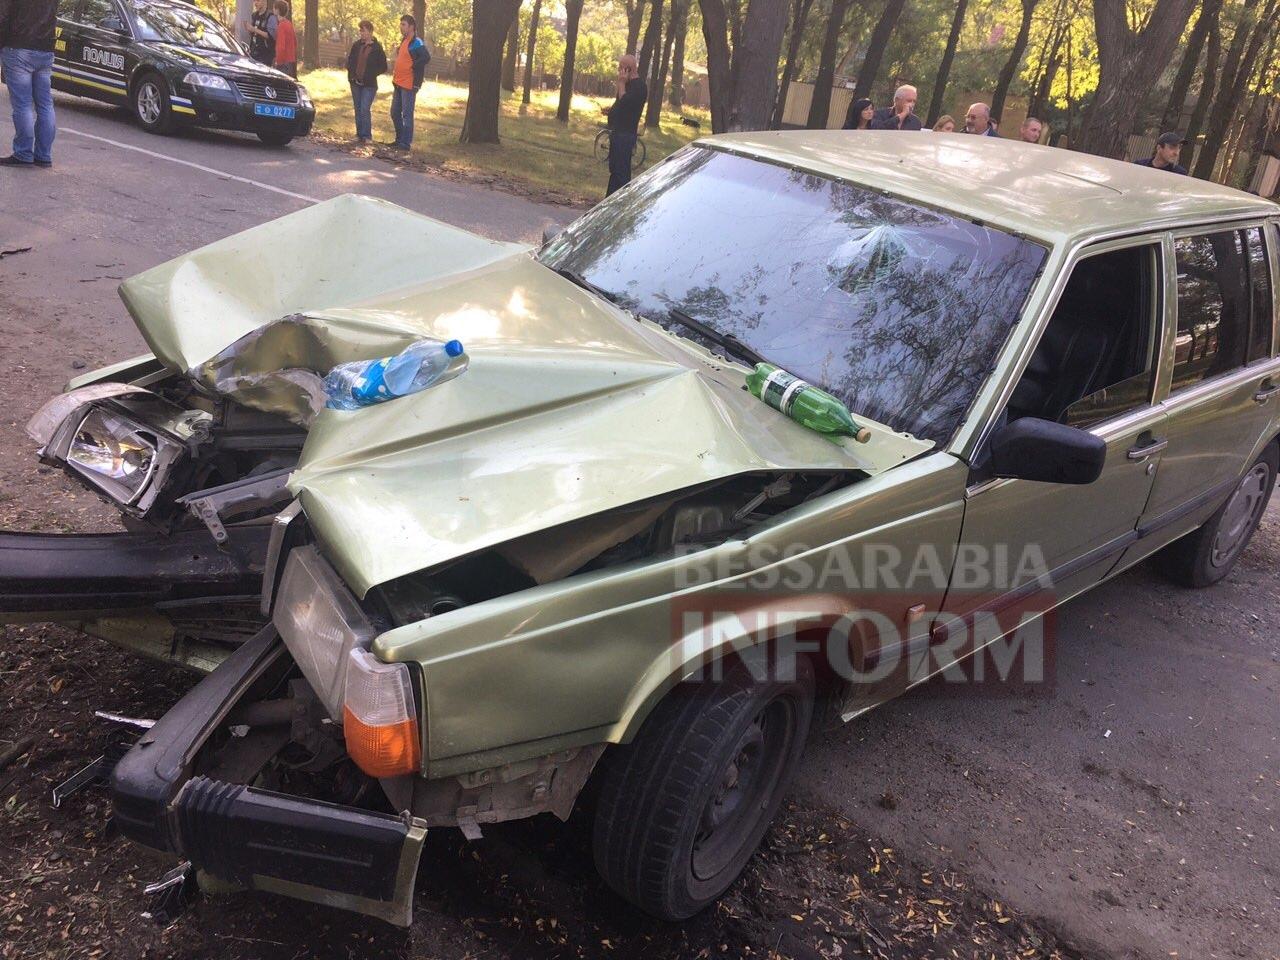 57ed192c4b12f_63464 Измаил: на проспекте Суворова произошло смертельное ДТП (фото)